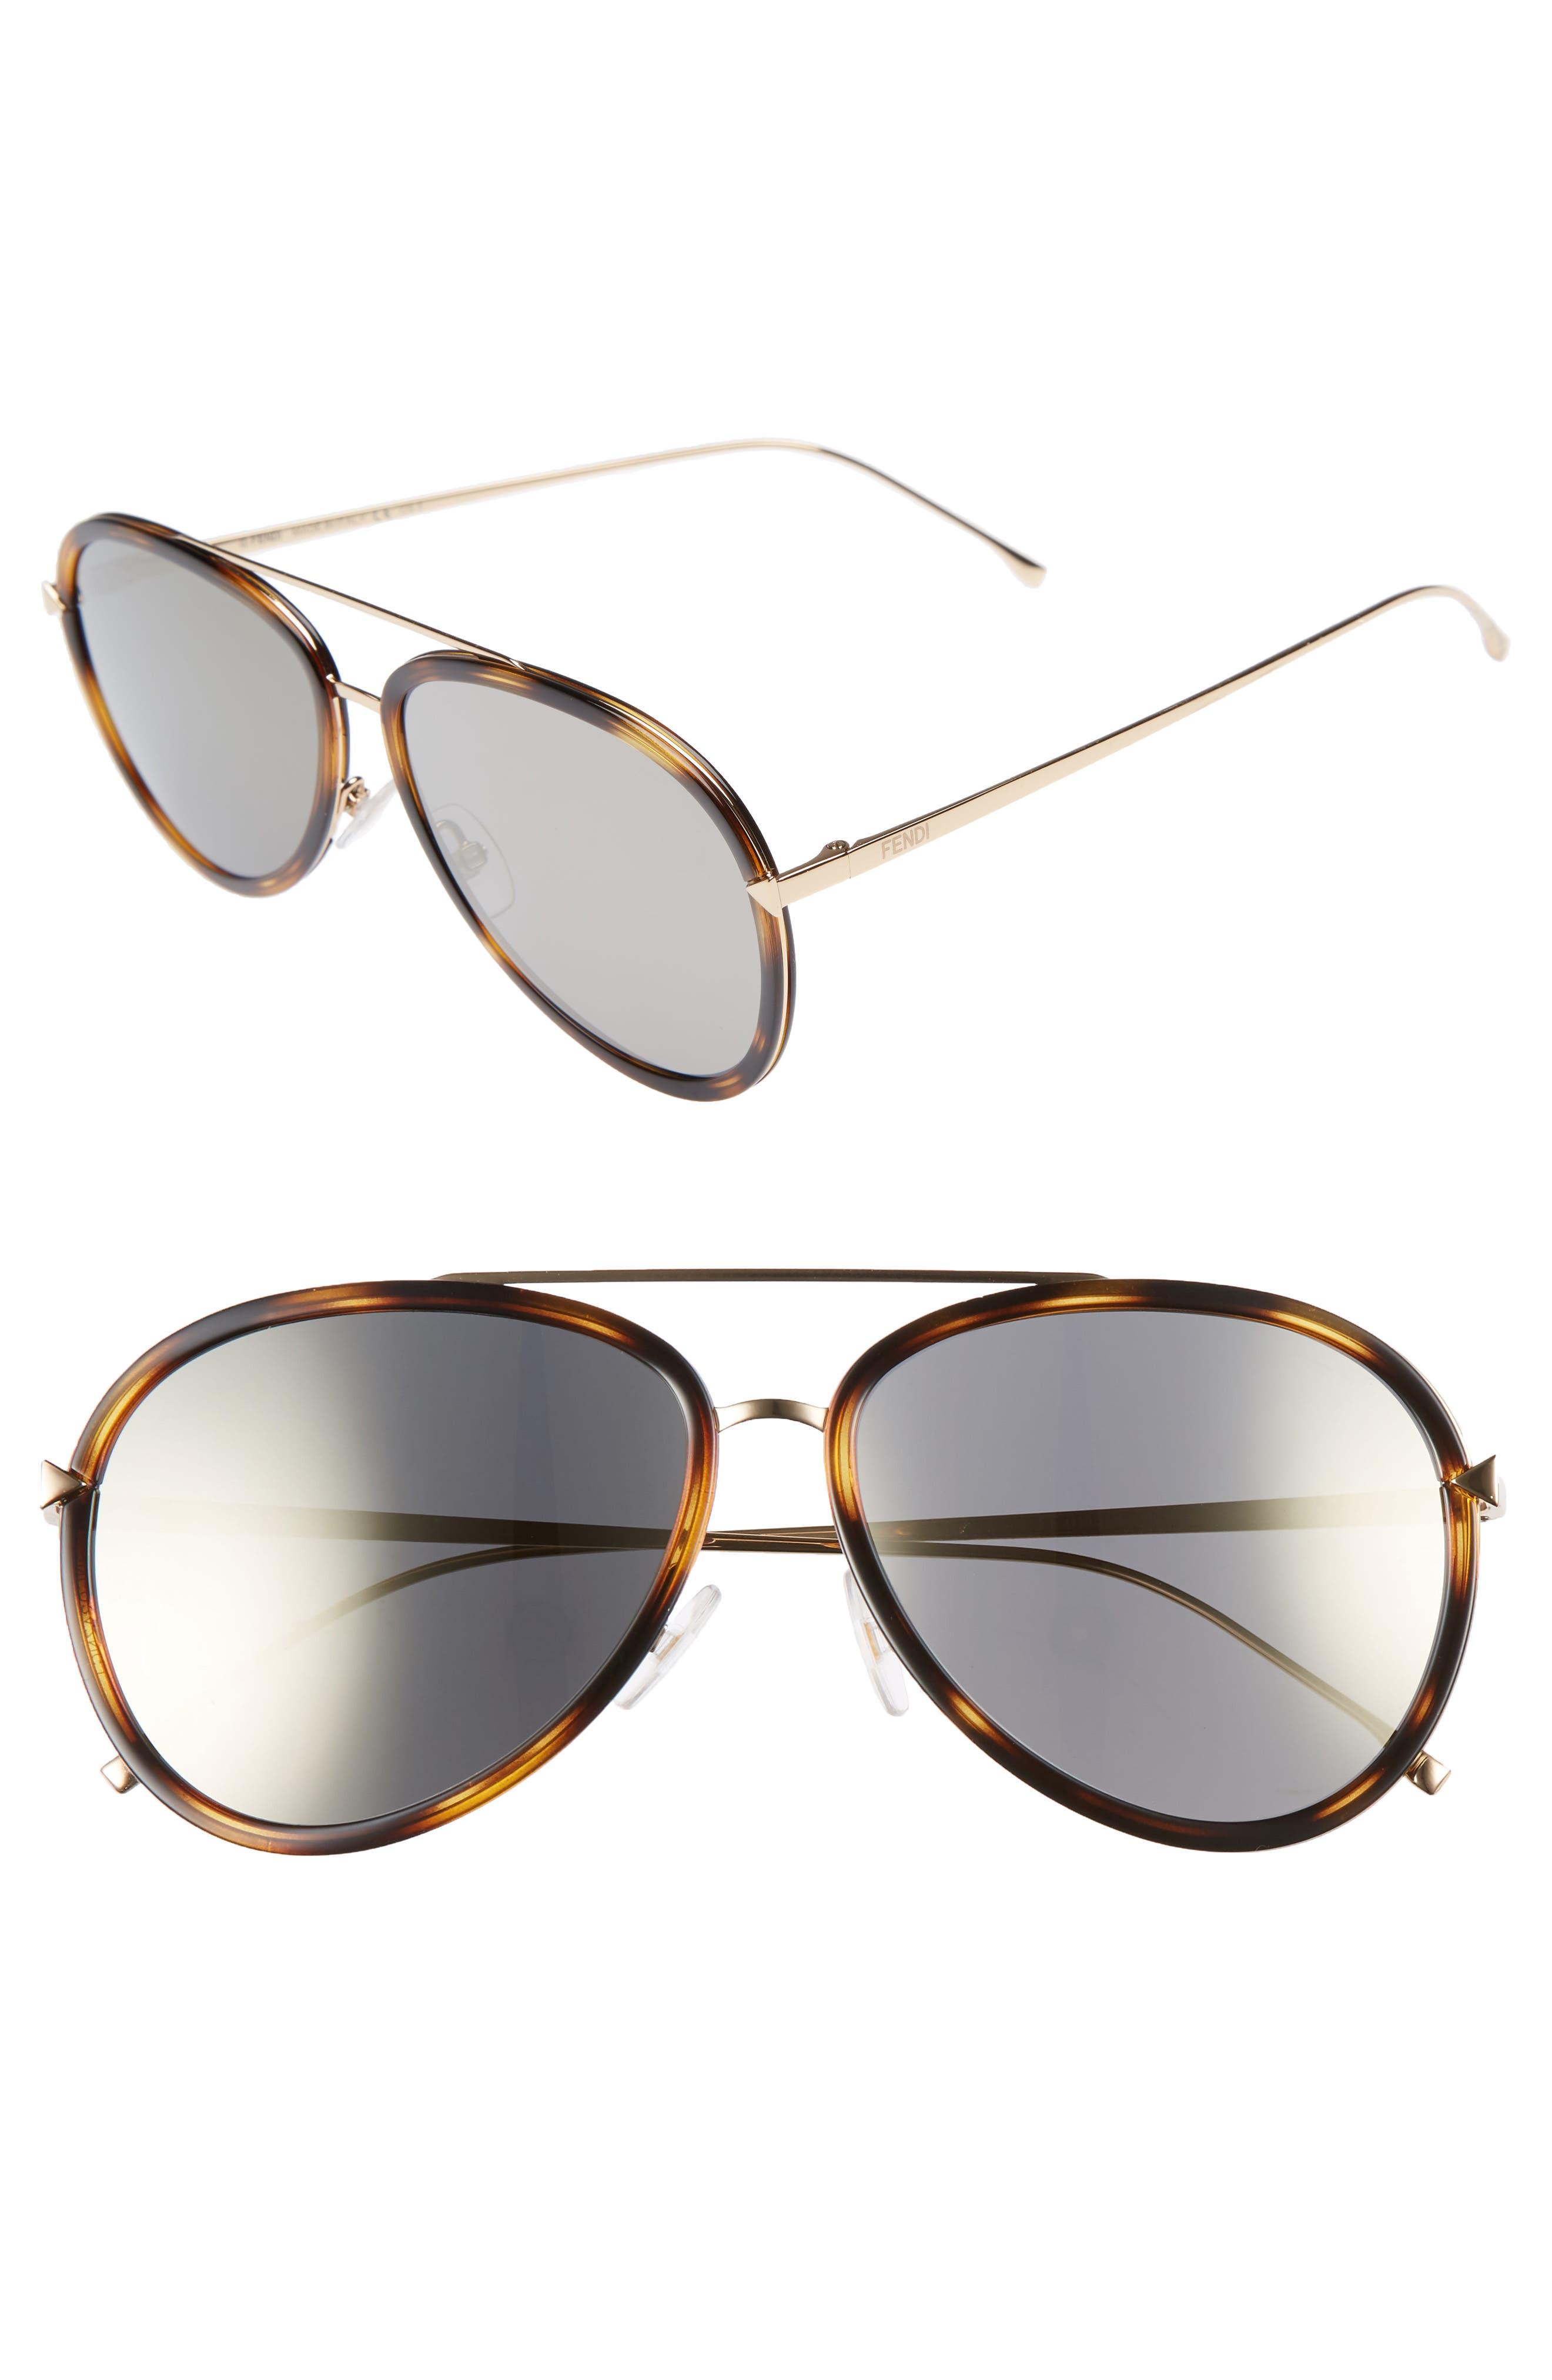 57mm Mirrored Lens Aviator Sunglasses,                             Main thumbnail 1, color,                             Havana Gold